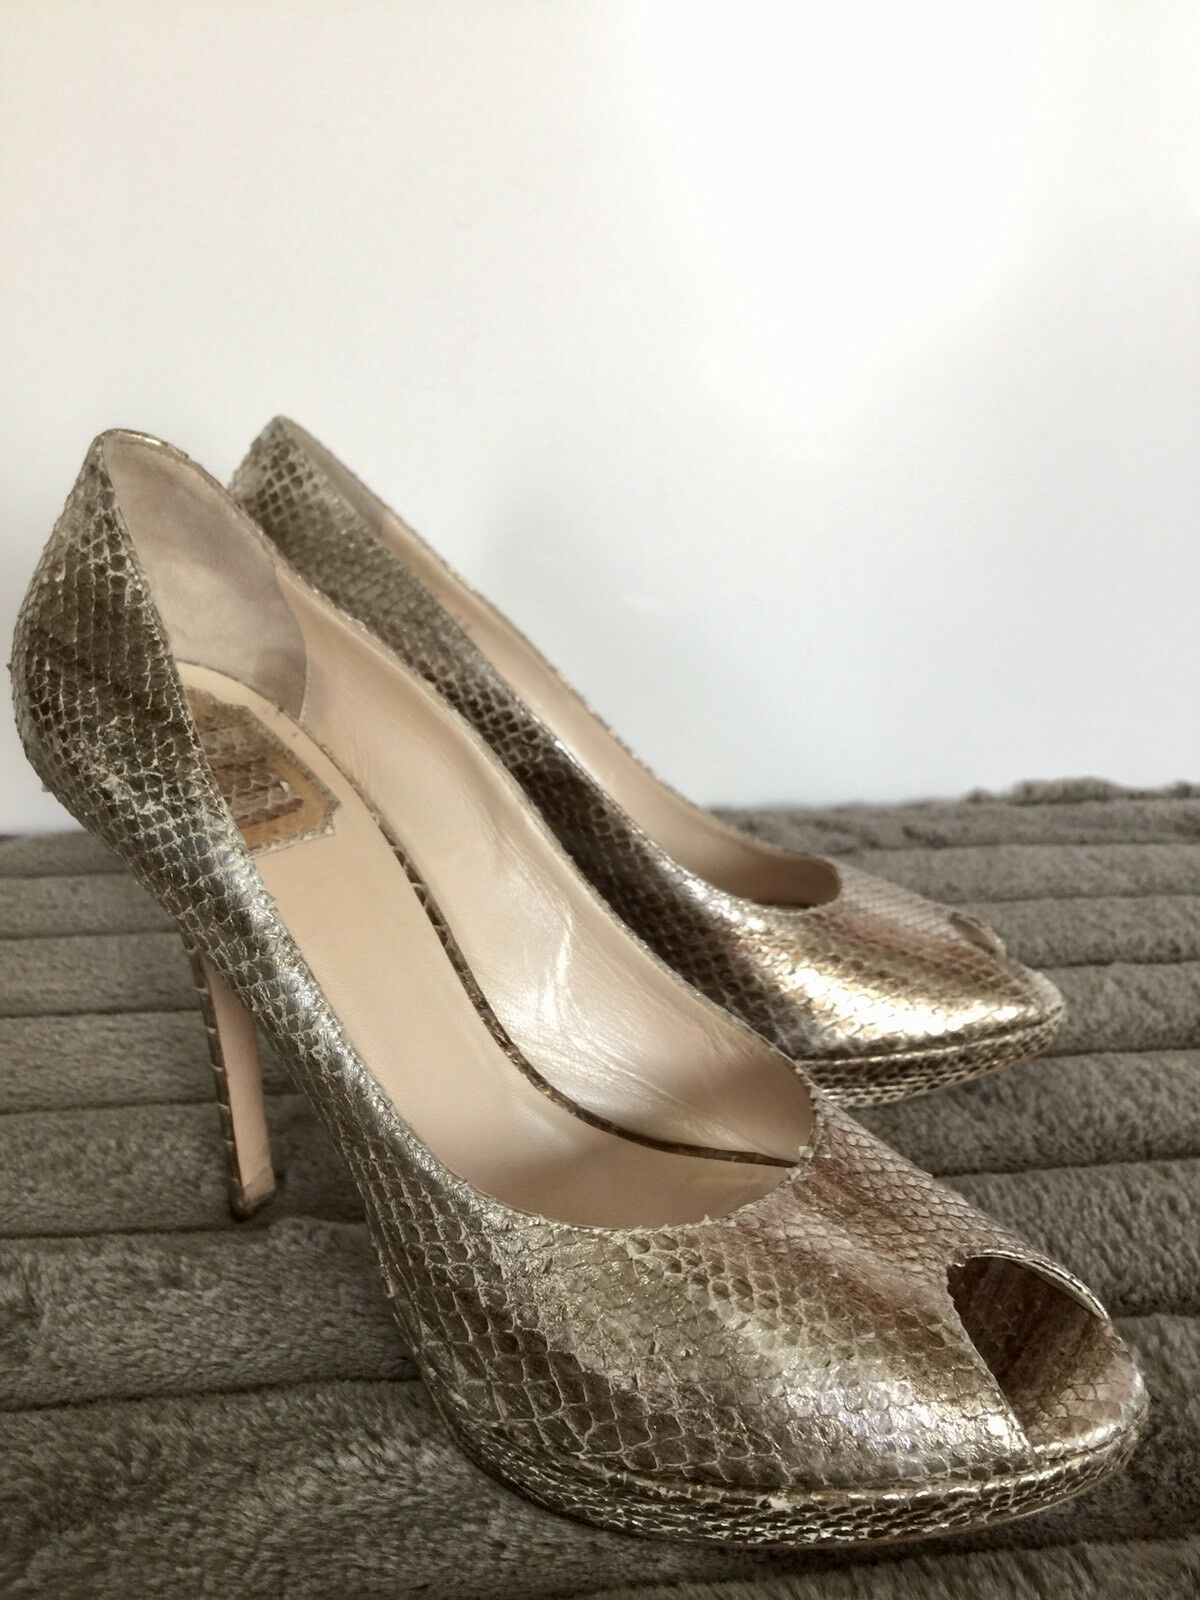 Auth. Christian Dior Miss Dior Snake Skin gold Silver Platform Pumps Heels, 40